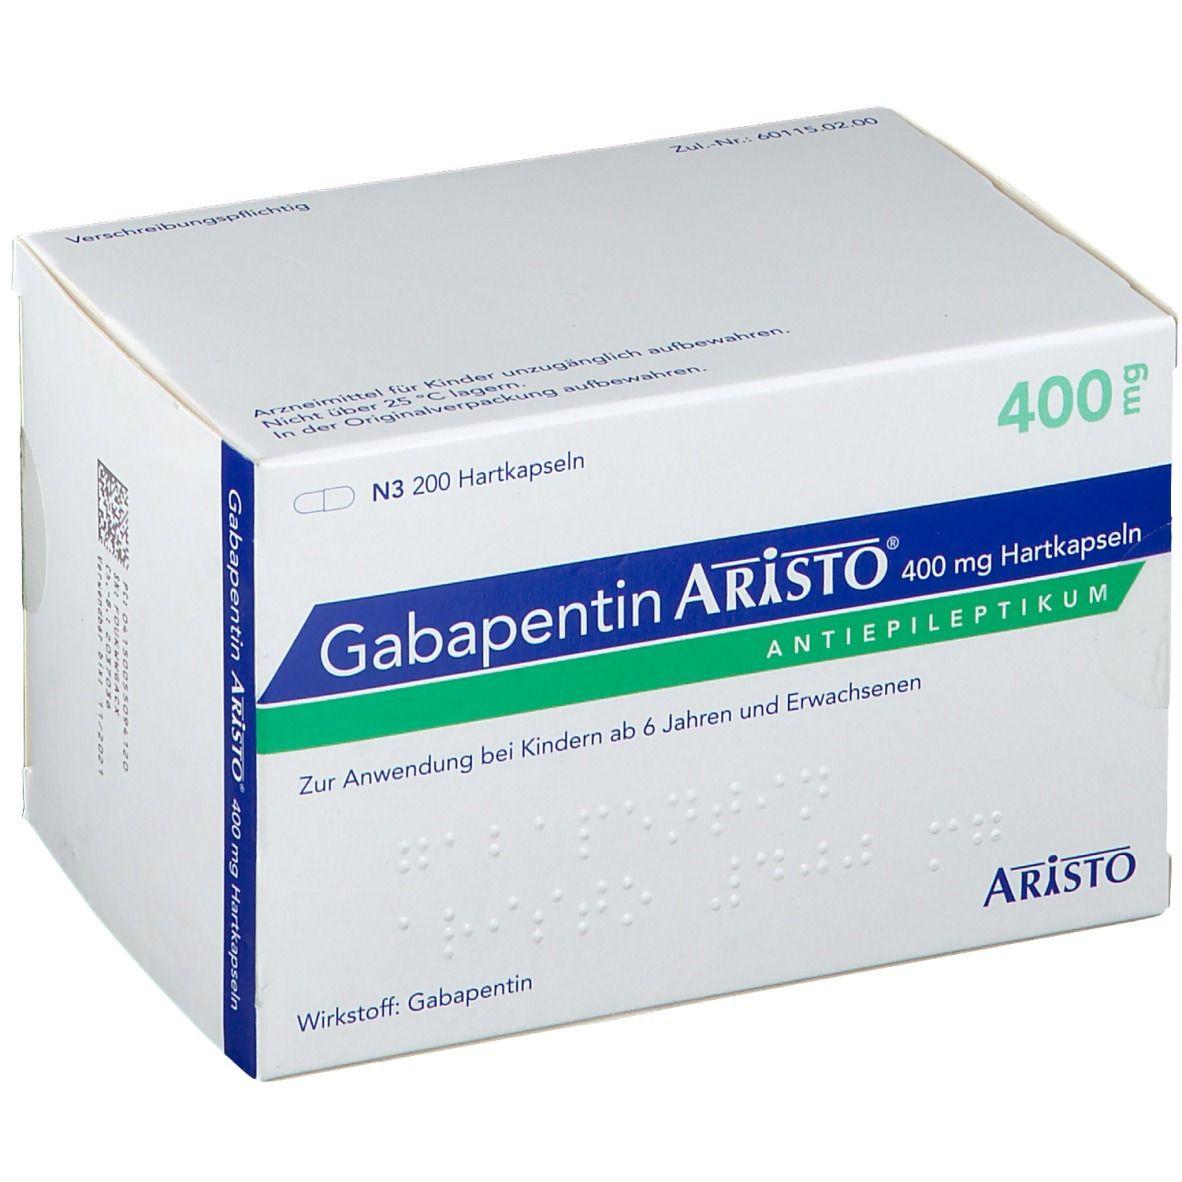 Ivermectin tablets dosage